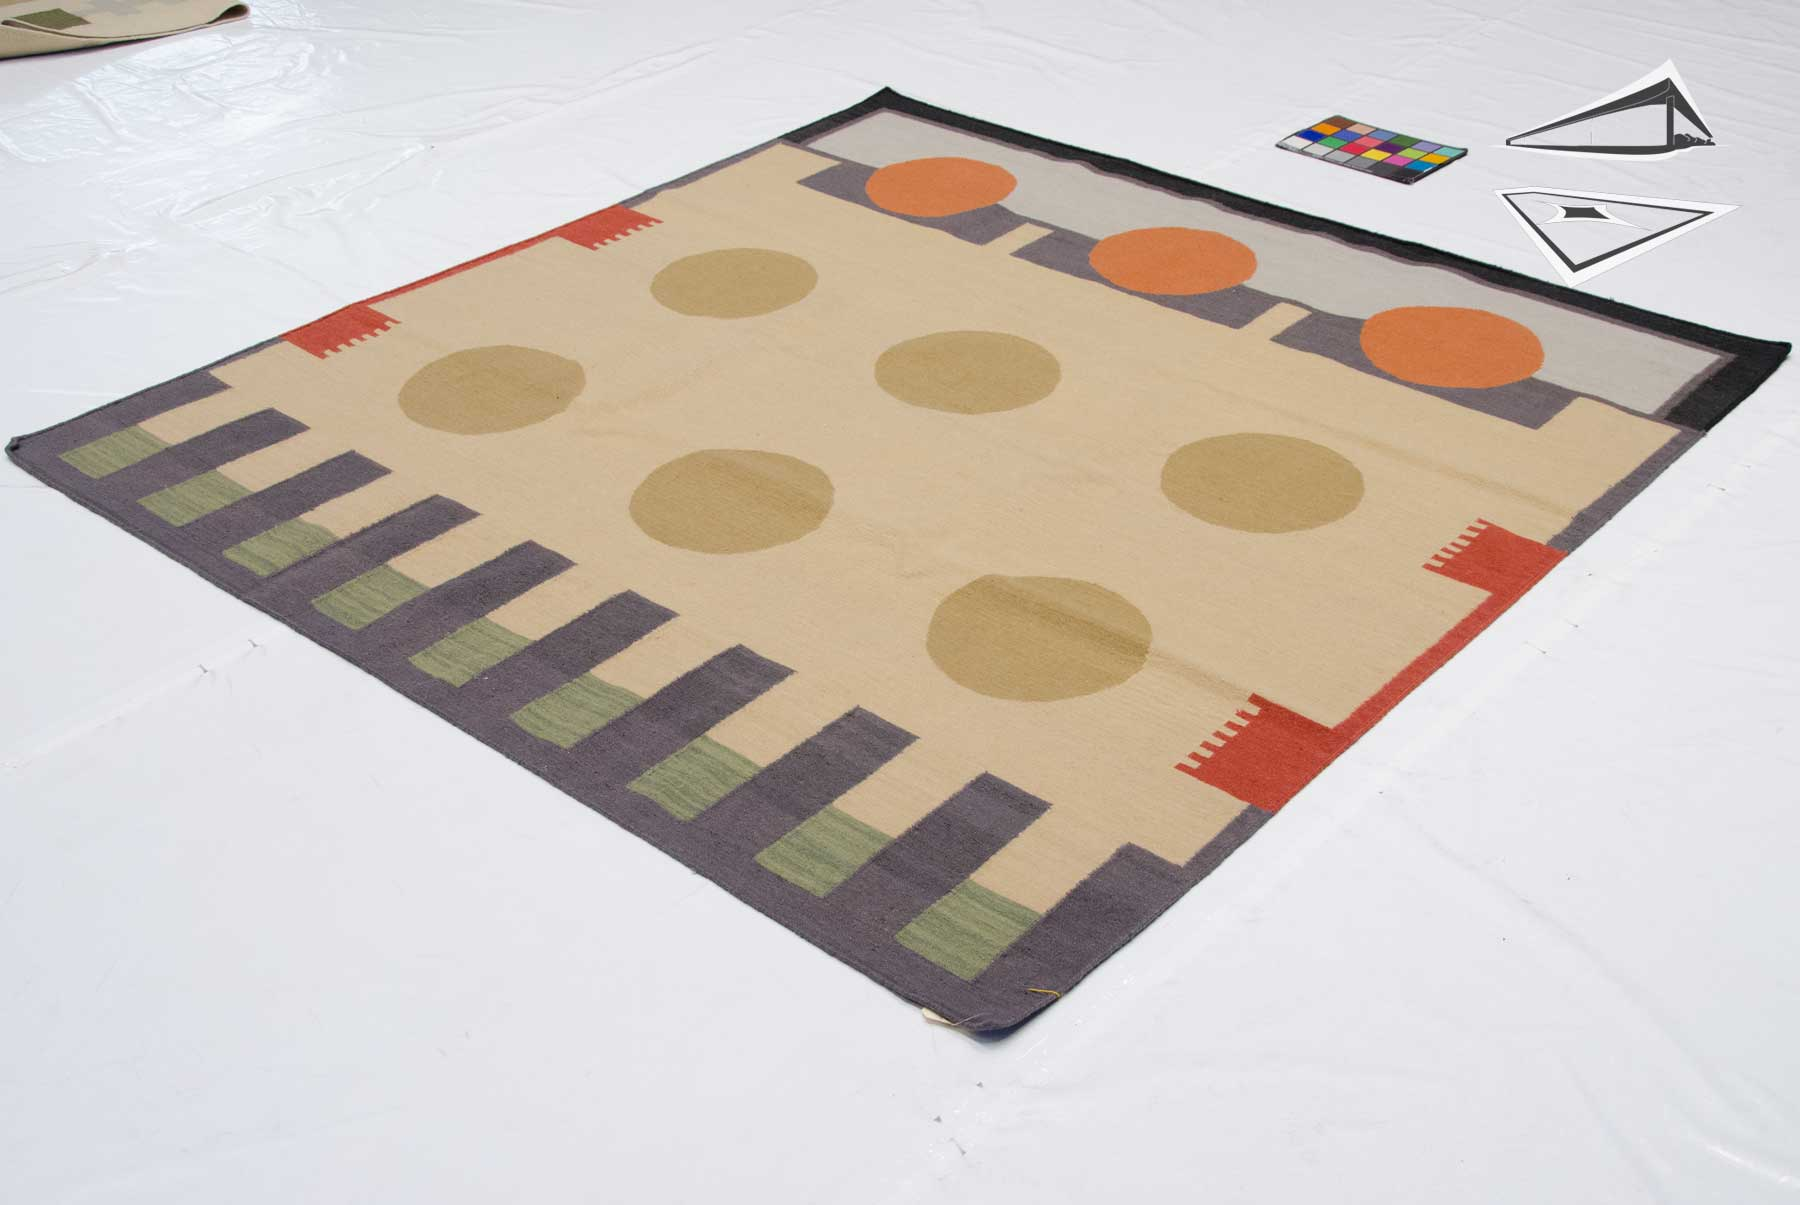 6x 6 Modern Design Kilim Style Square Rug Large Rugs